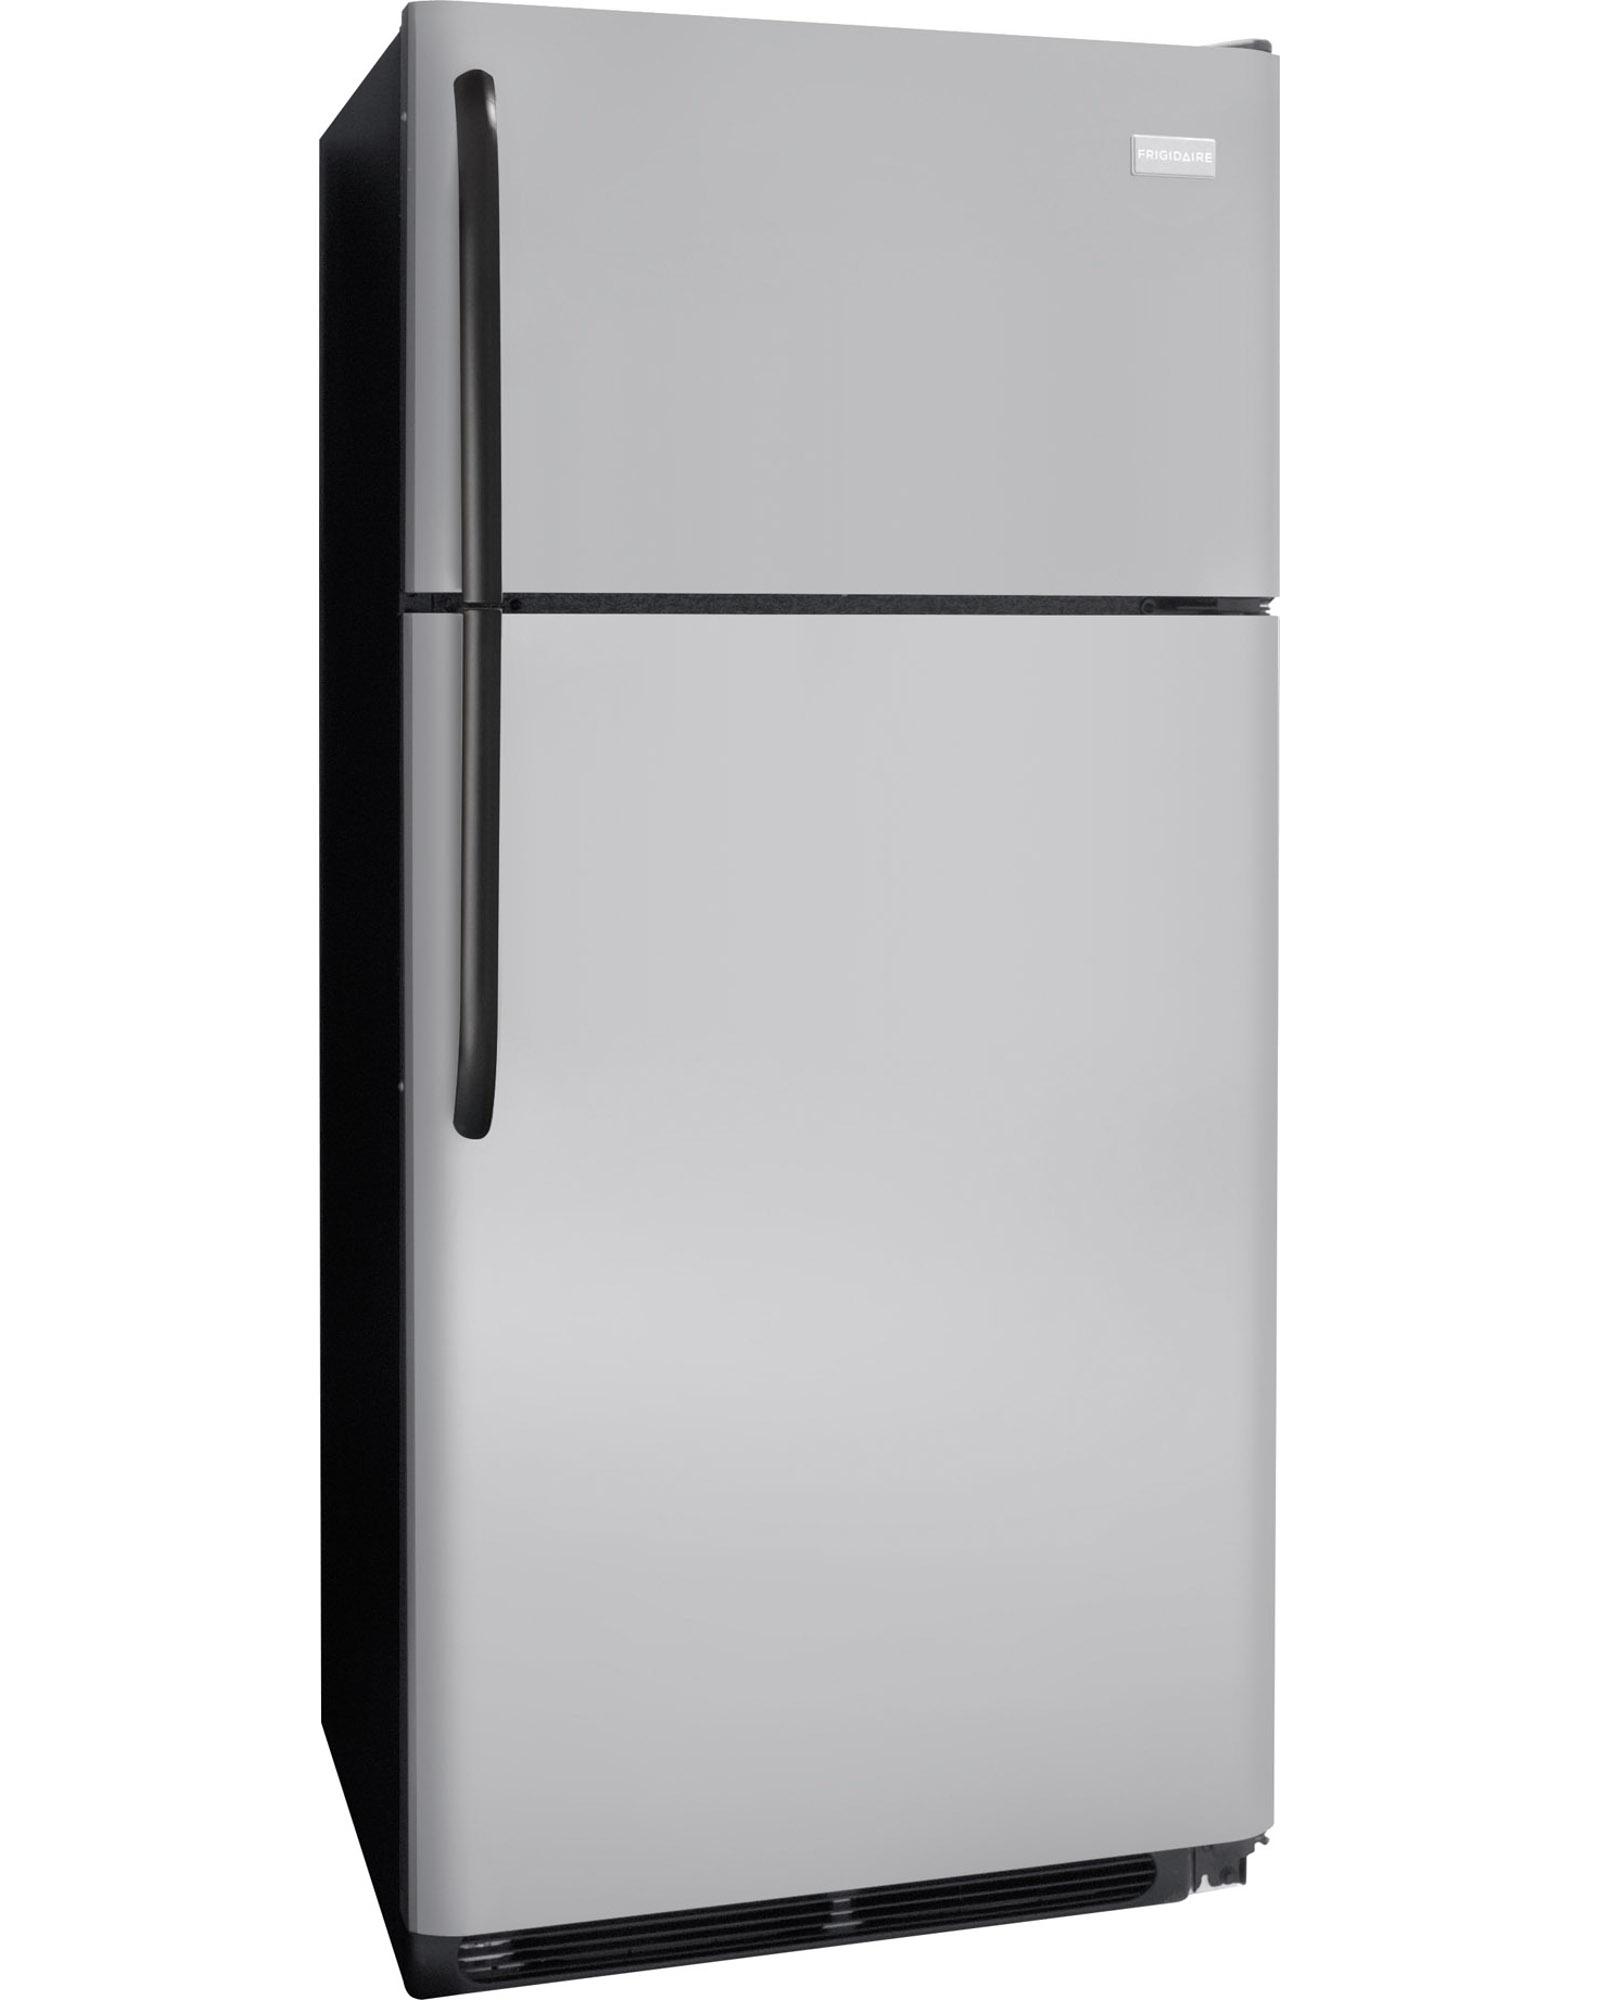 Frigidaire FFHT1831QM 18 cu. ft. Top Mount Refrigerator - Silver Mist